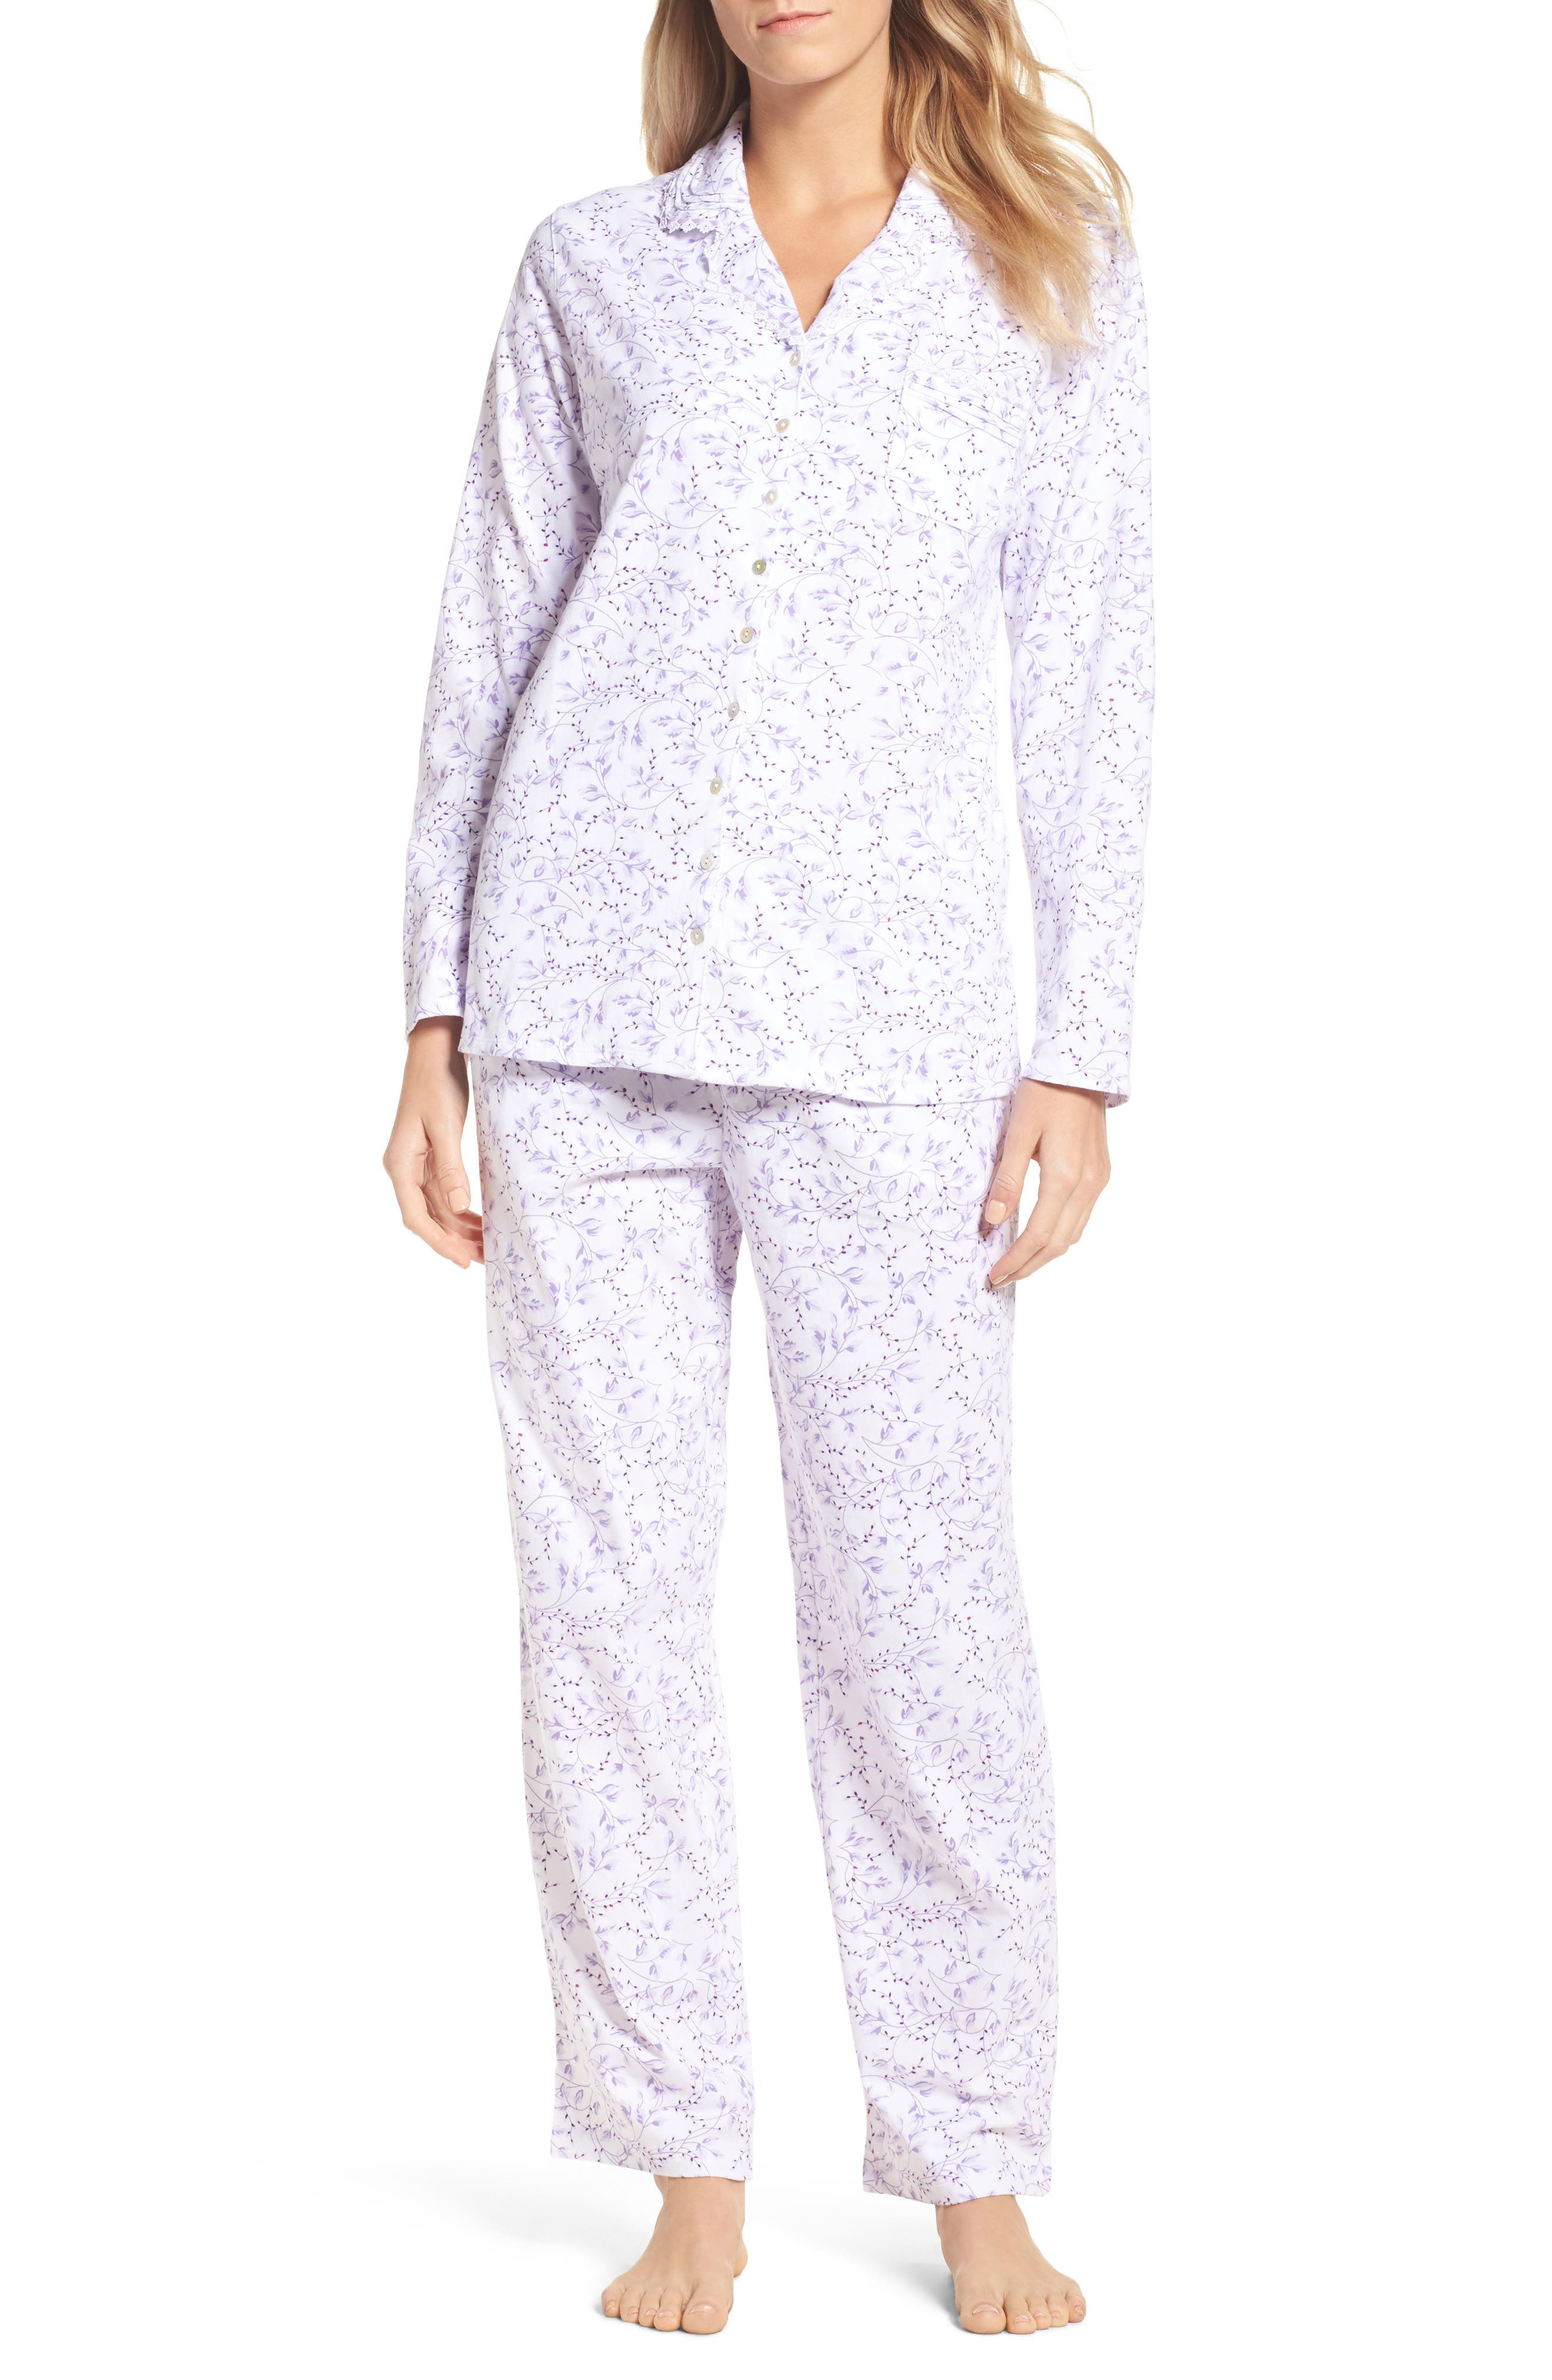 Eileen West Notch Collar Pajamas